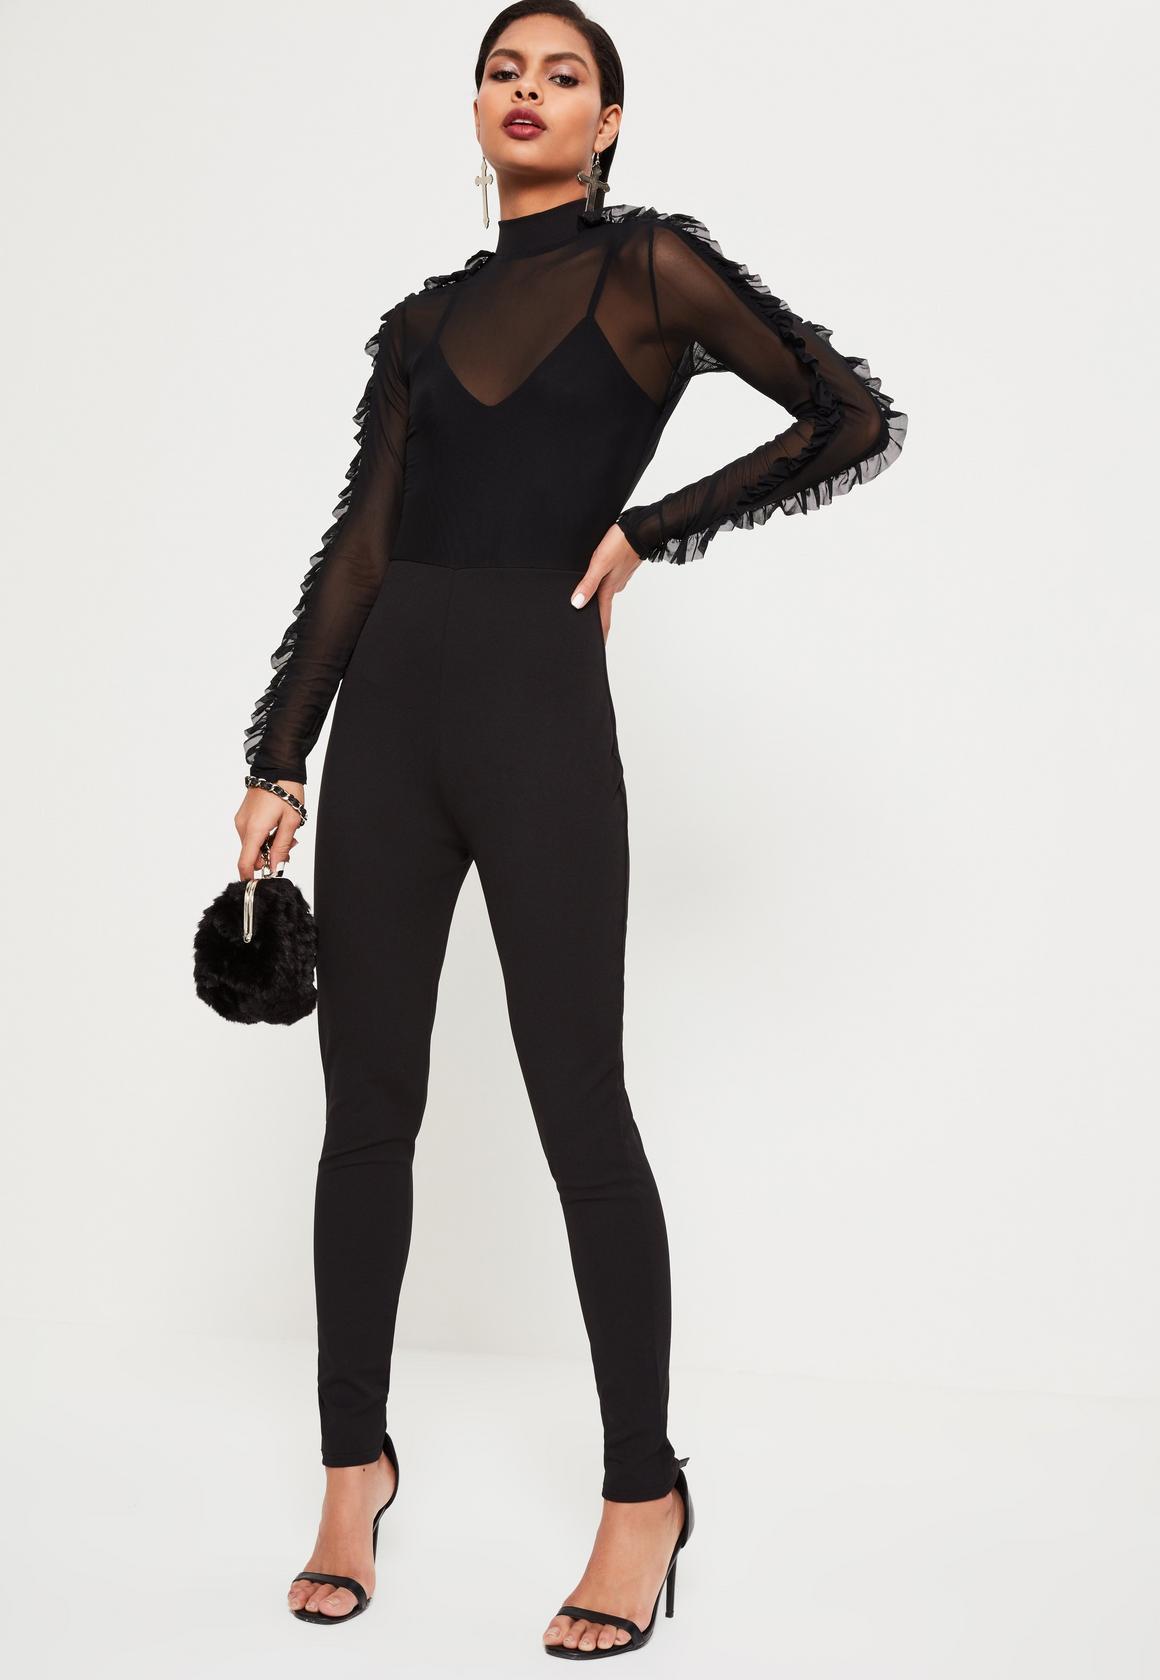 black long sleeve jumpsuit black mesh top frill sleeve jumpsuit black mesh top frill sleeve jumpsuit qvovpqr